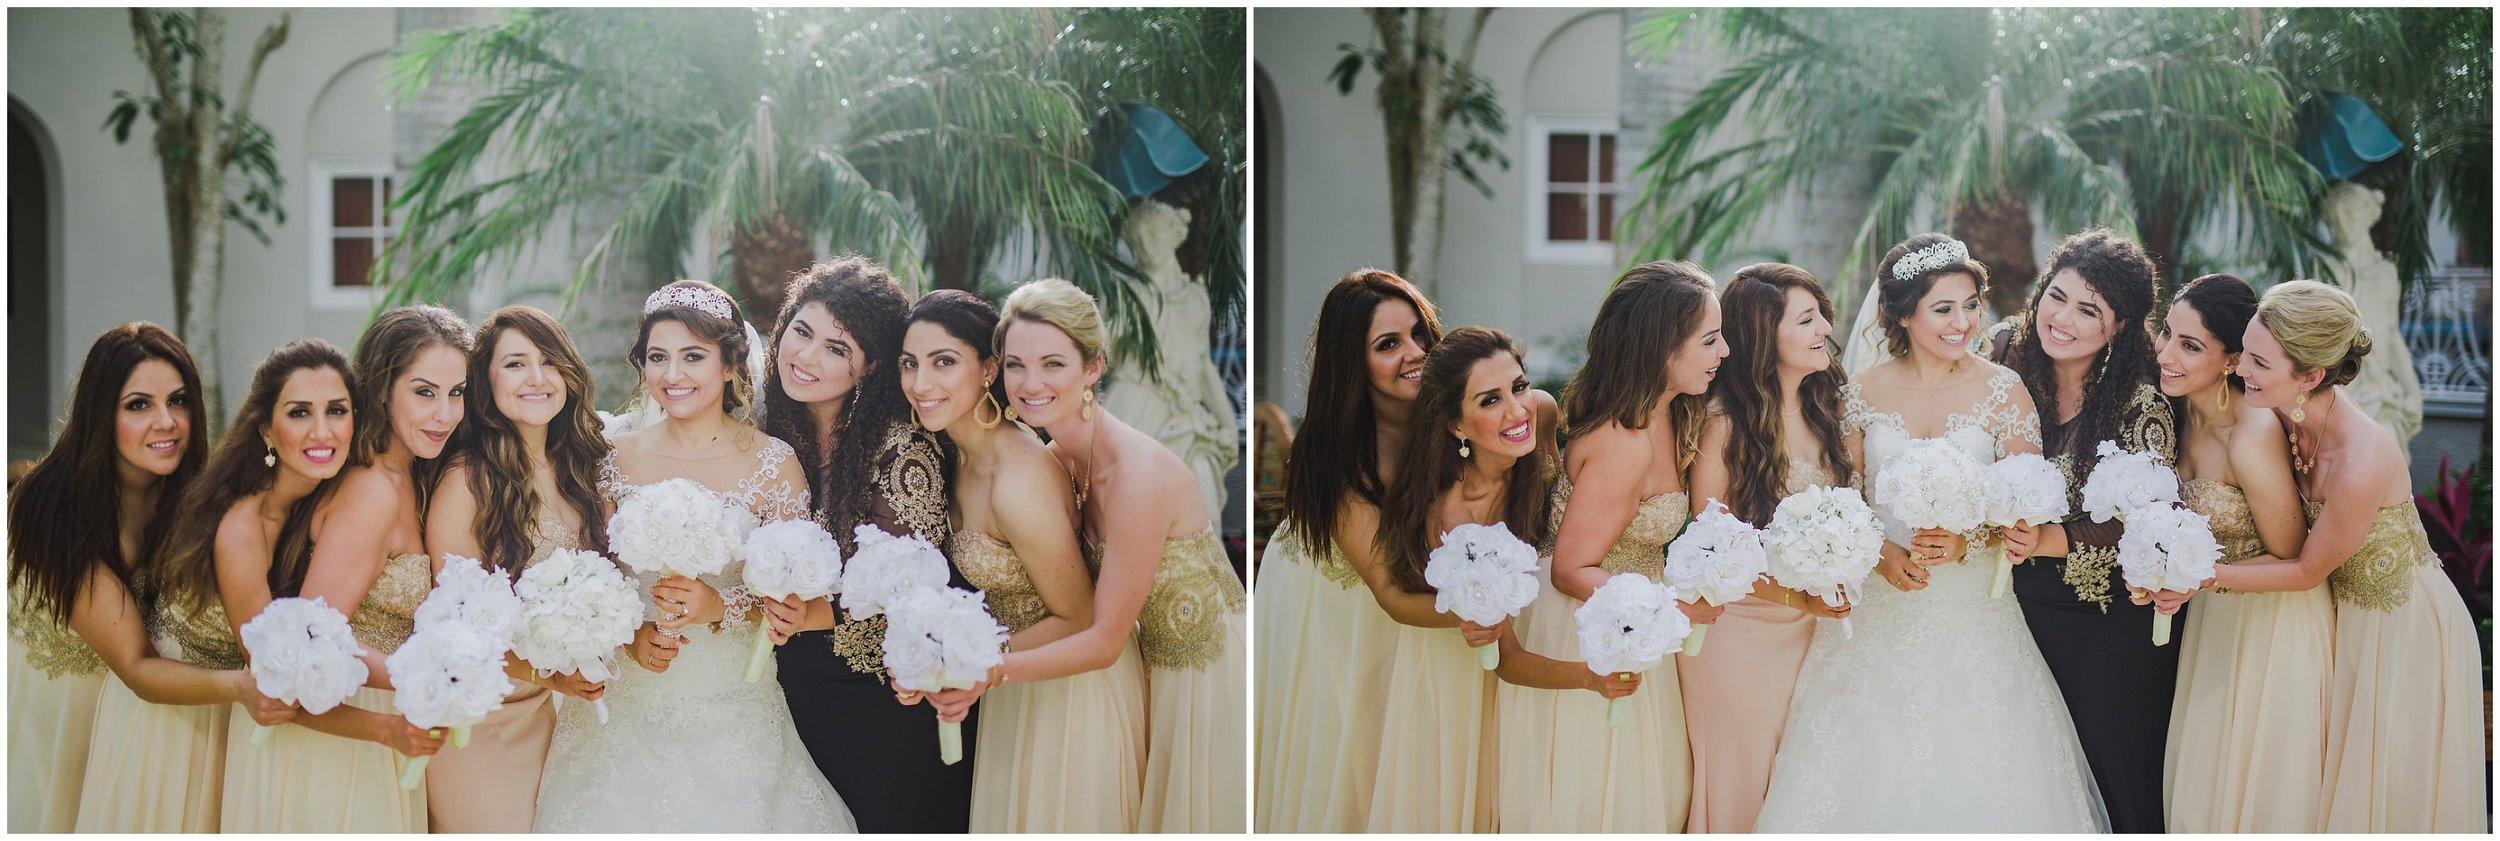 Le Cape Weddings- Destination Wedding Photography -ShayanandNikkie-268-X3_LuxuryDestinationPhotographer.jpg